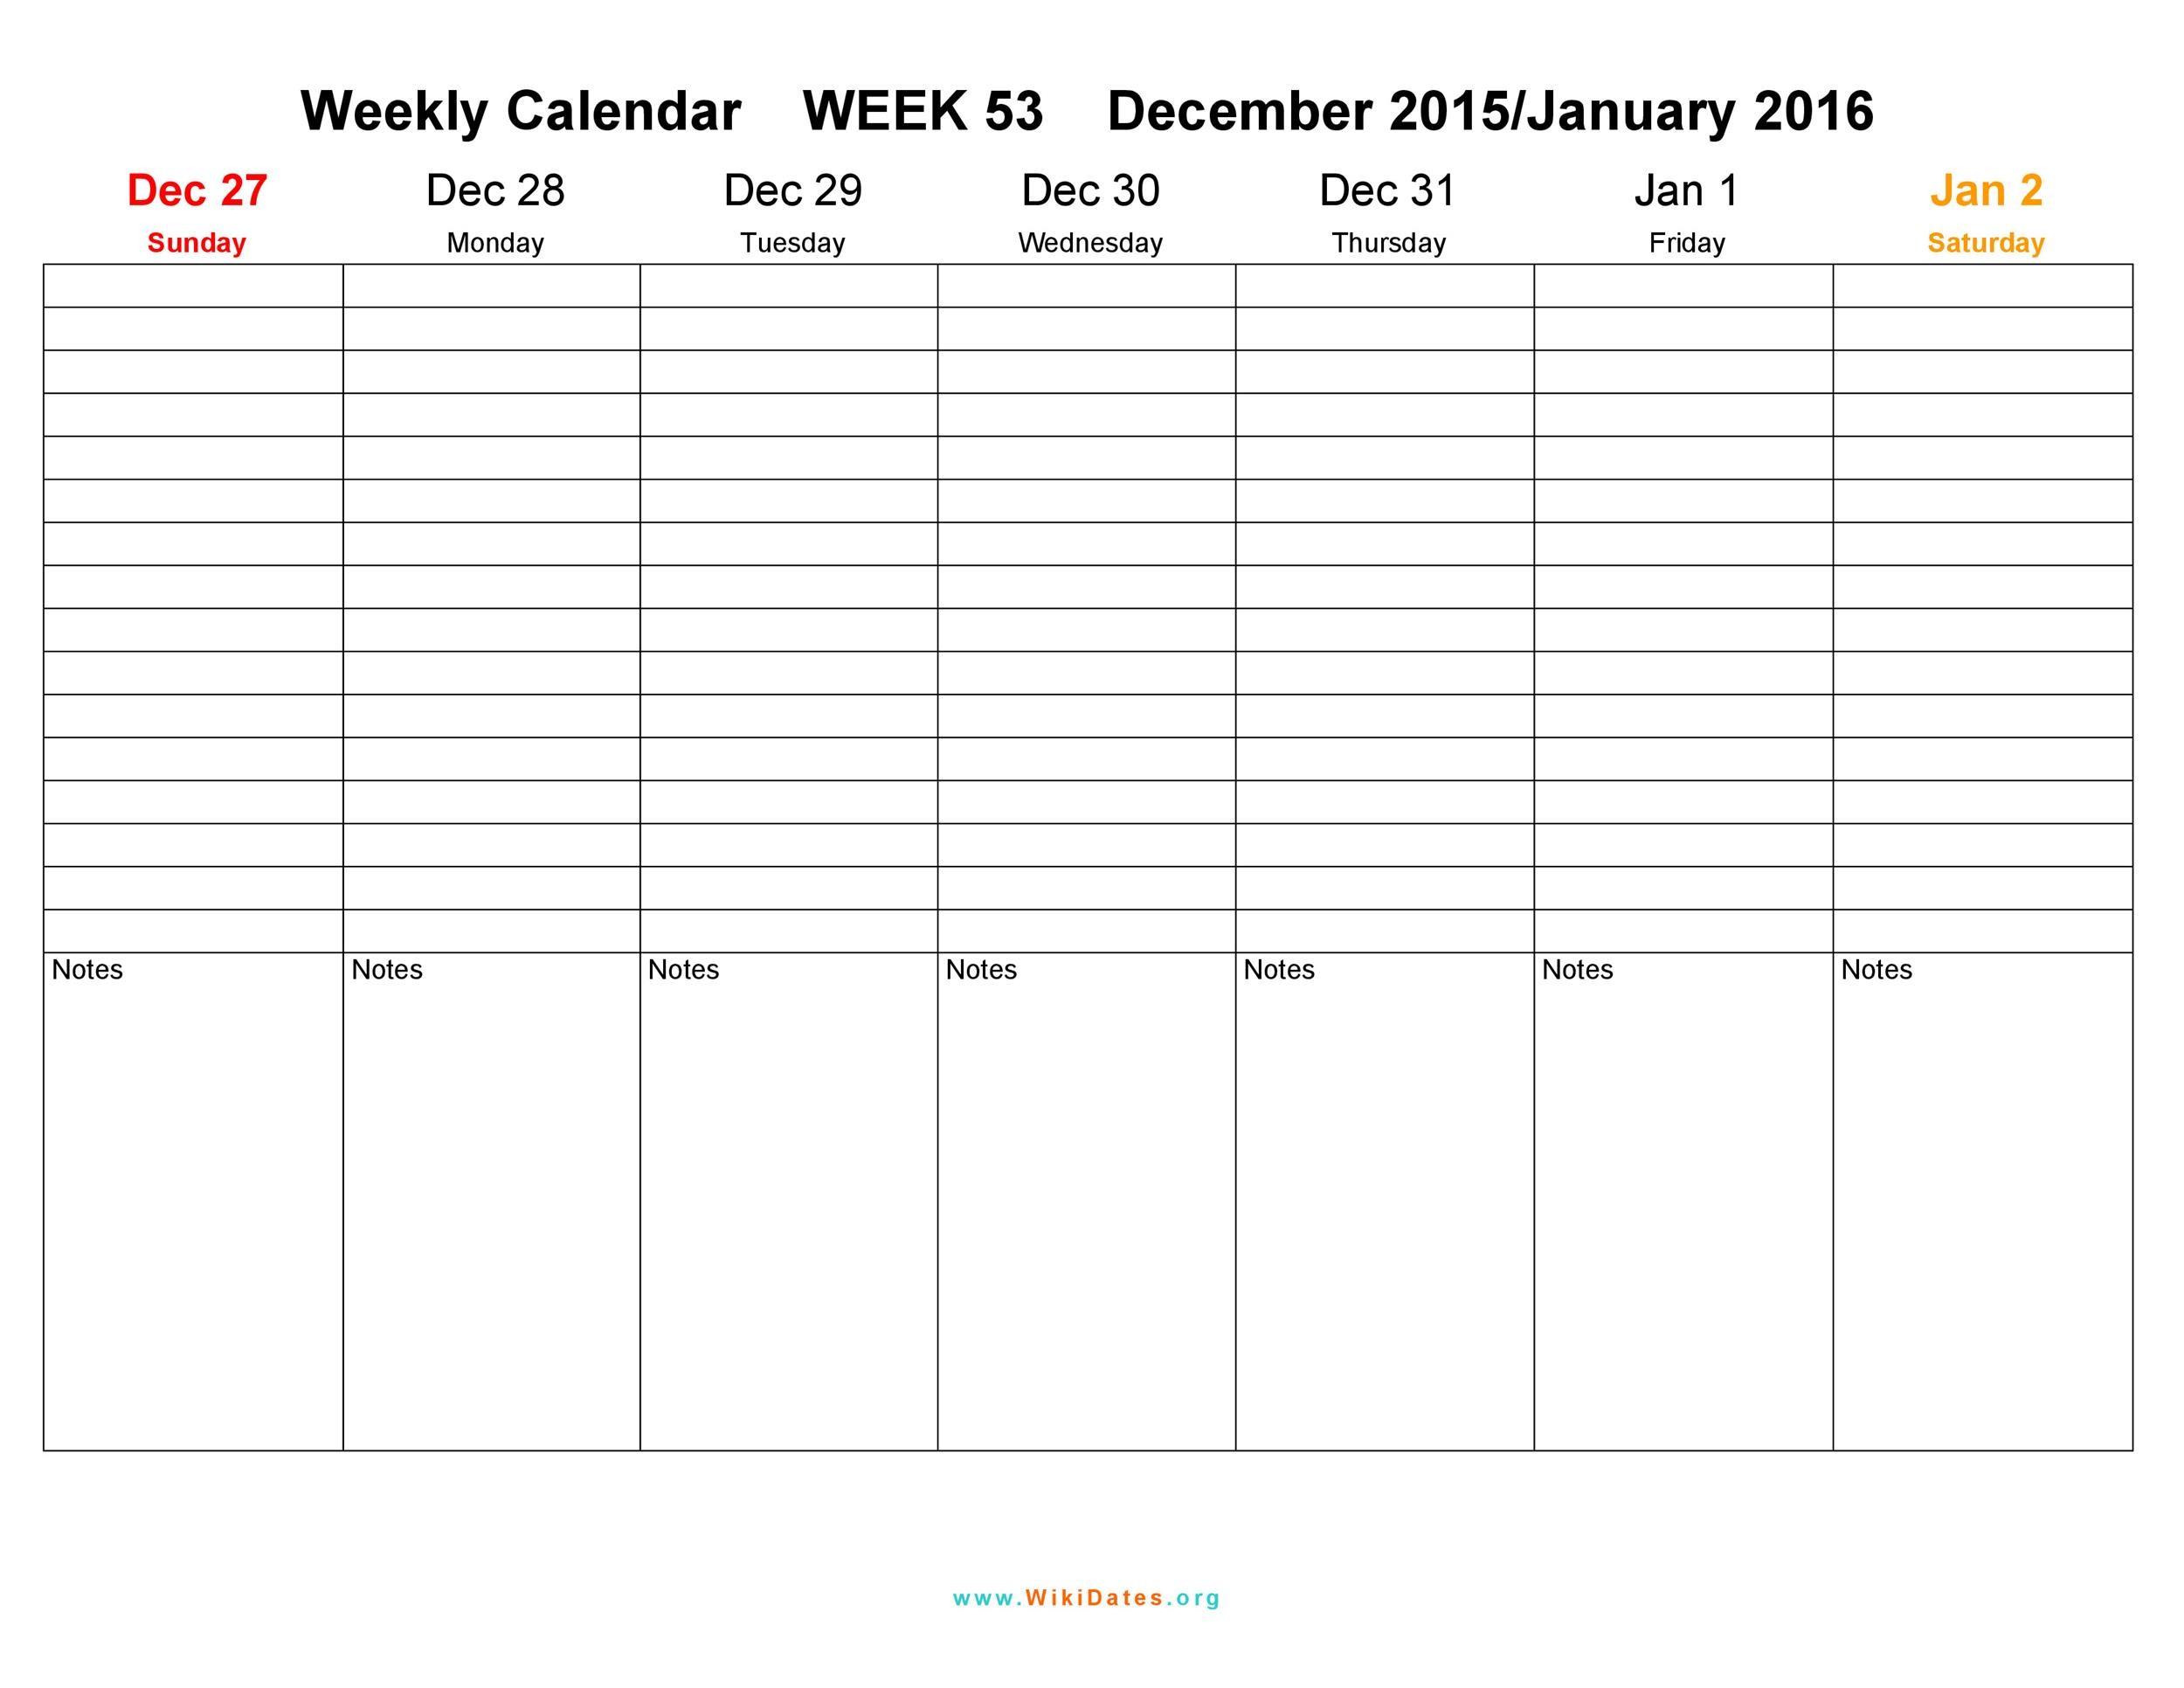 26 Blank Weekly Calendar Templates PDF, Excel, Word ᐅ Template Lab